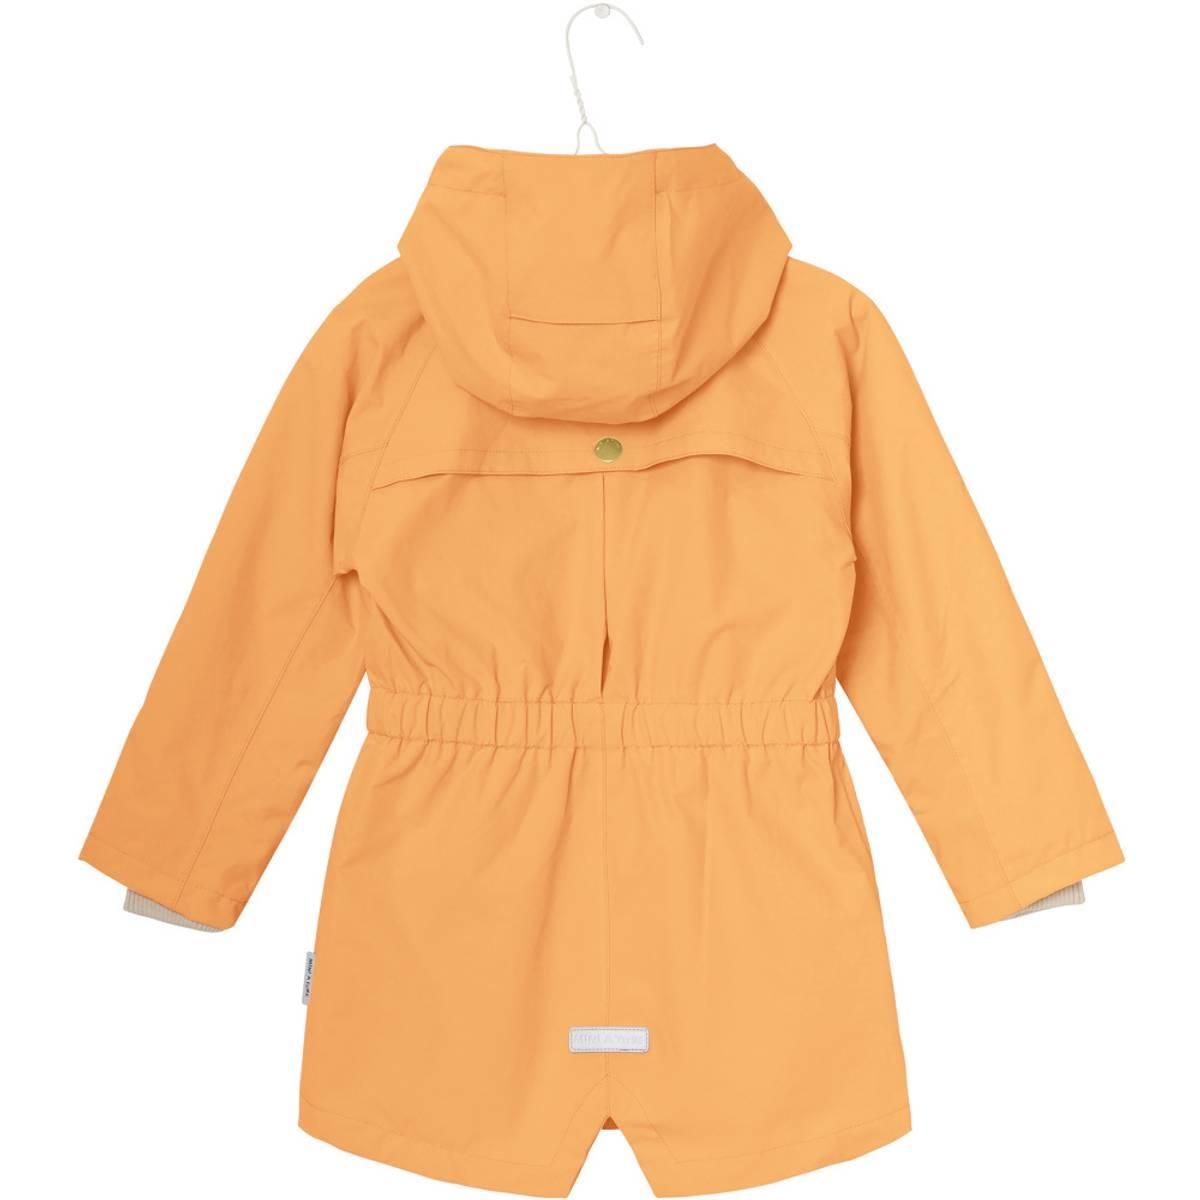 jakke vigga chamois orange